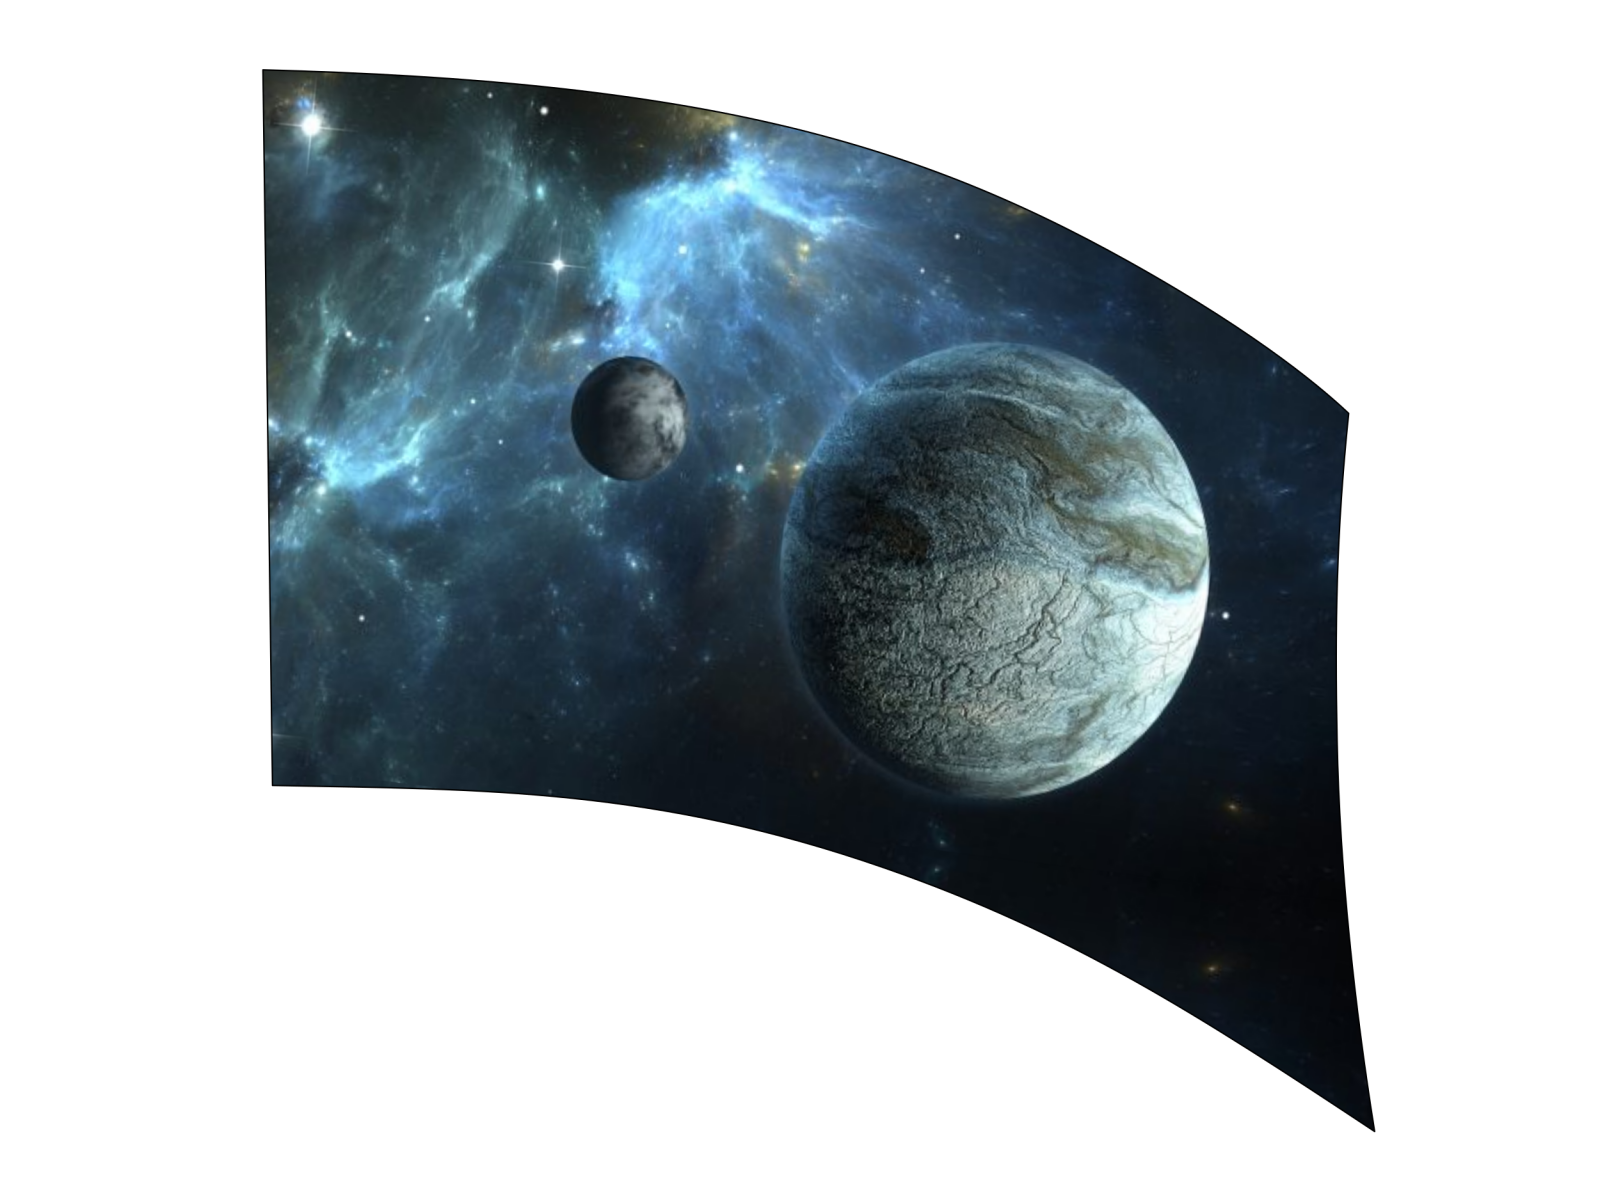 050108s - 36x54 Standard Alien Solar System